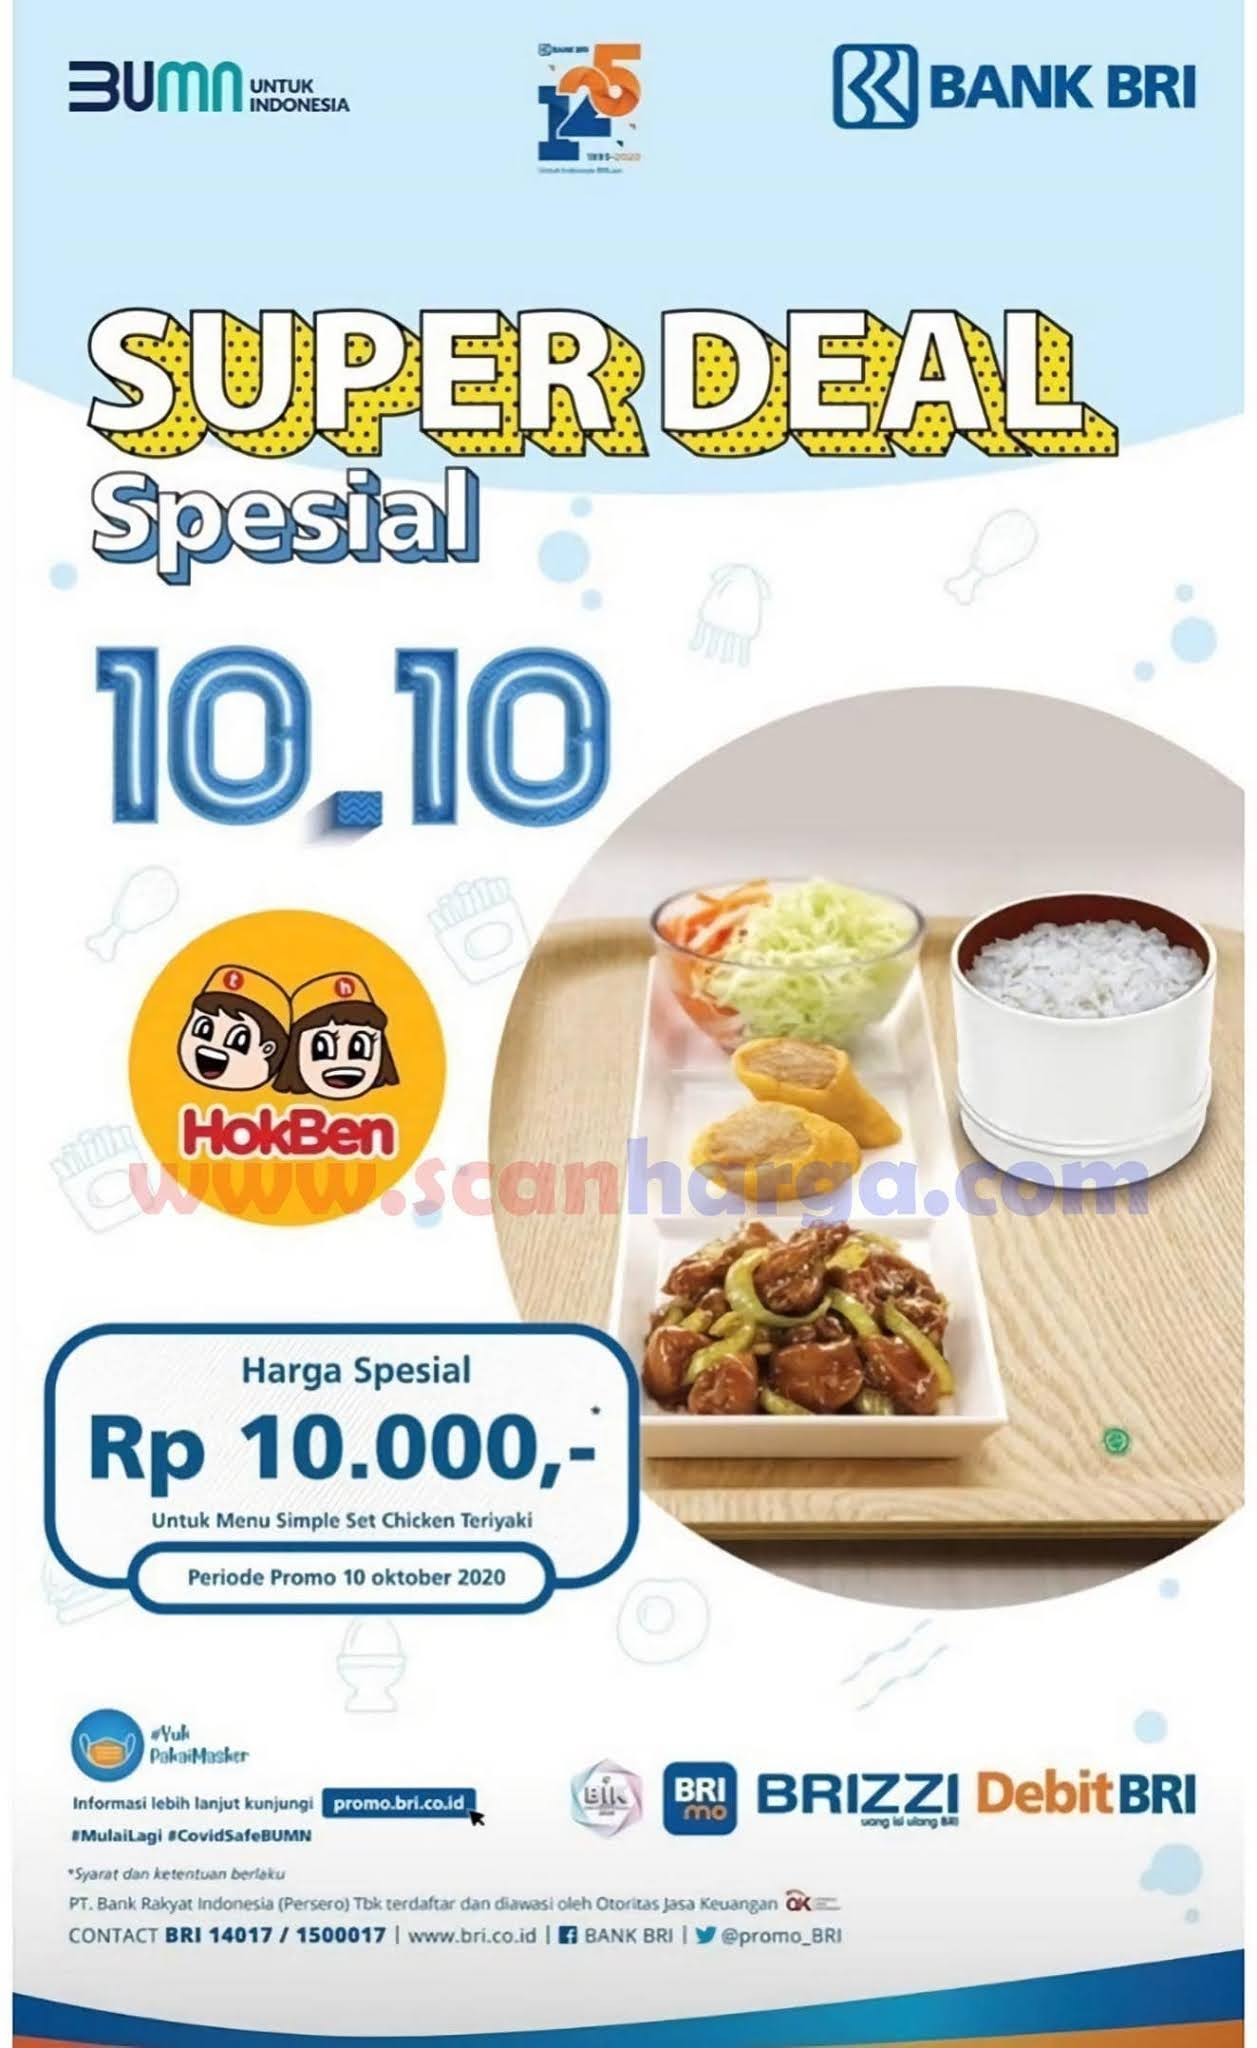 Promo Hokben Super Deal Spesial 10.10 Bank BRI Periode 10 Oktober 2020